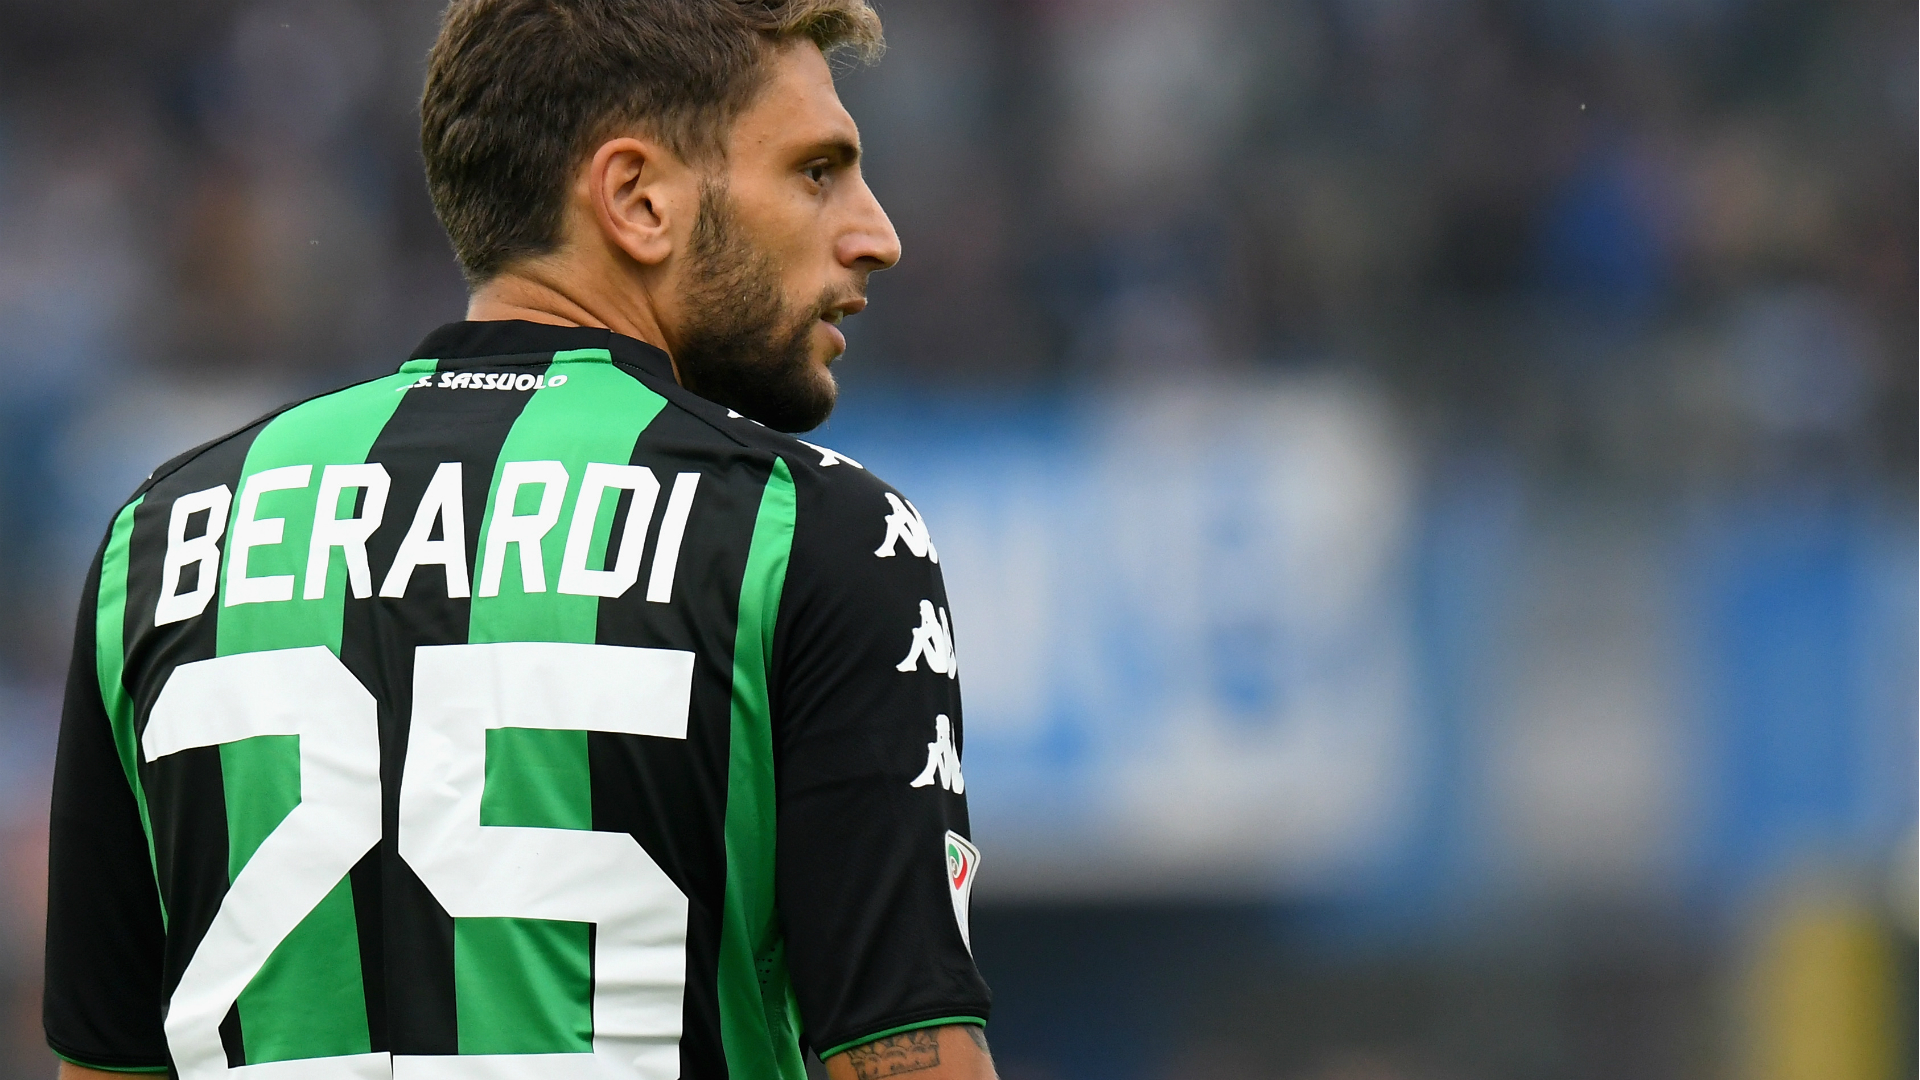 Alex Sandro e Lichtsteiner squalificati: salteranno Juve-Udinese